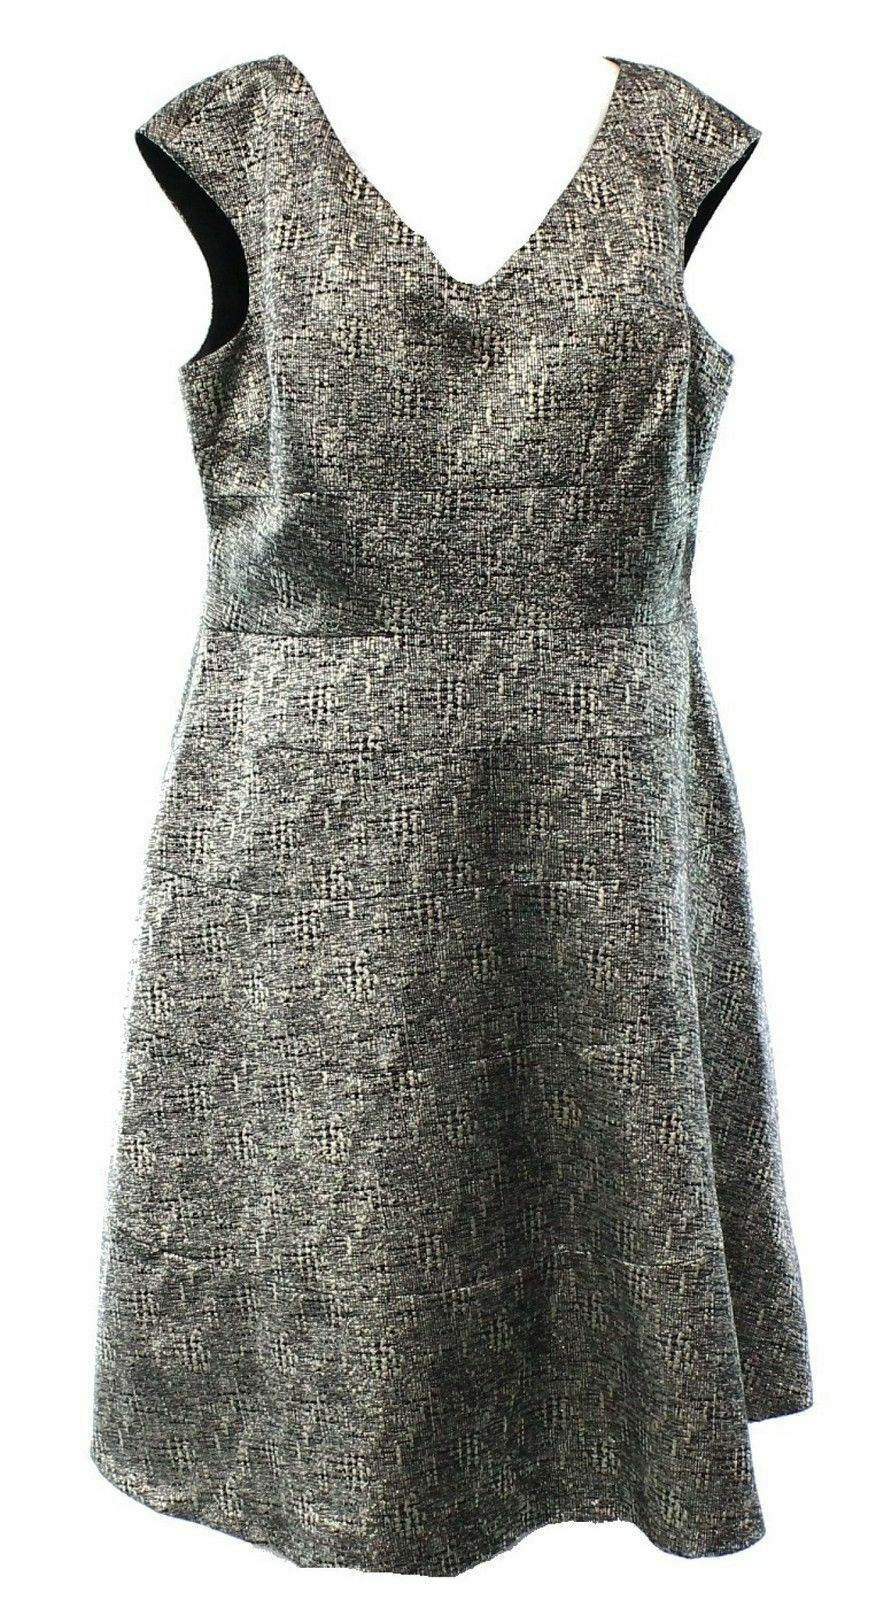 Anne Klein Women's Dresses for sale   eBay